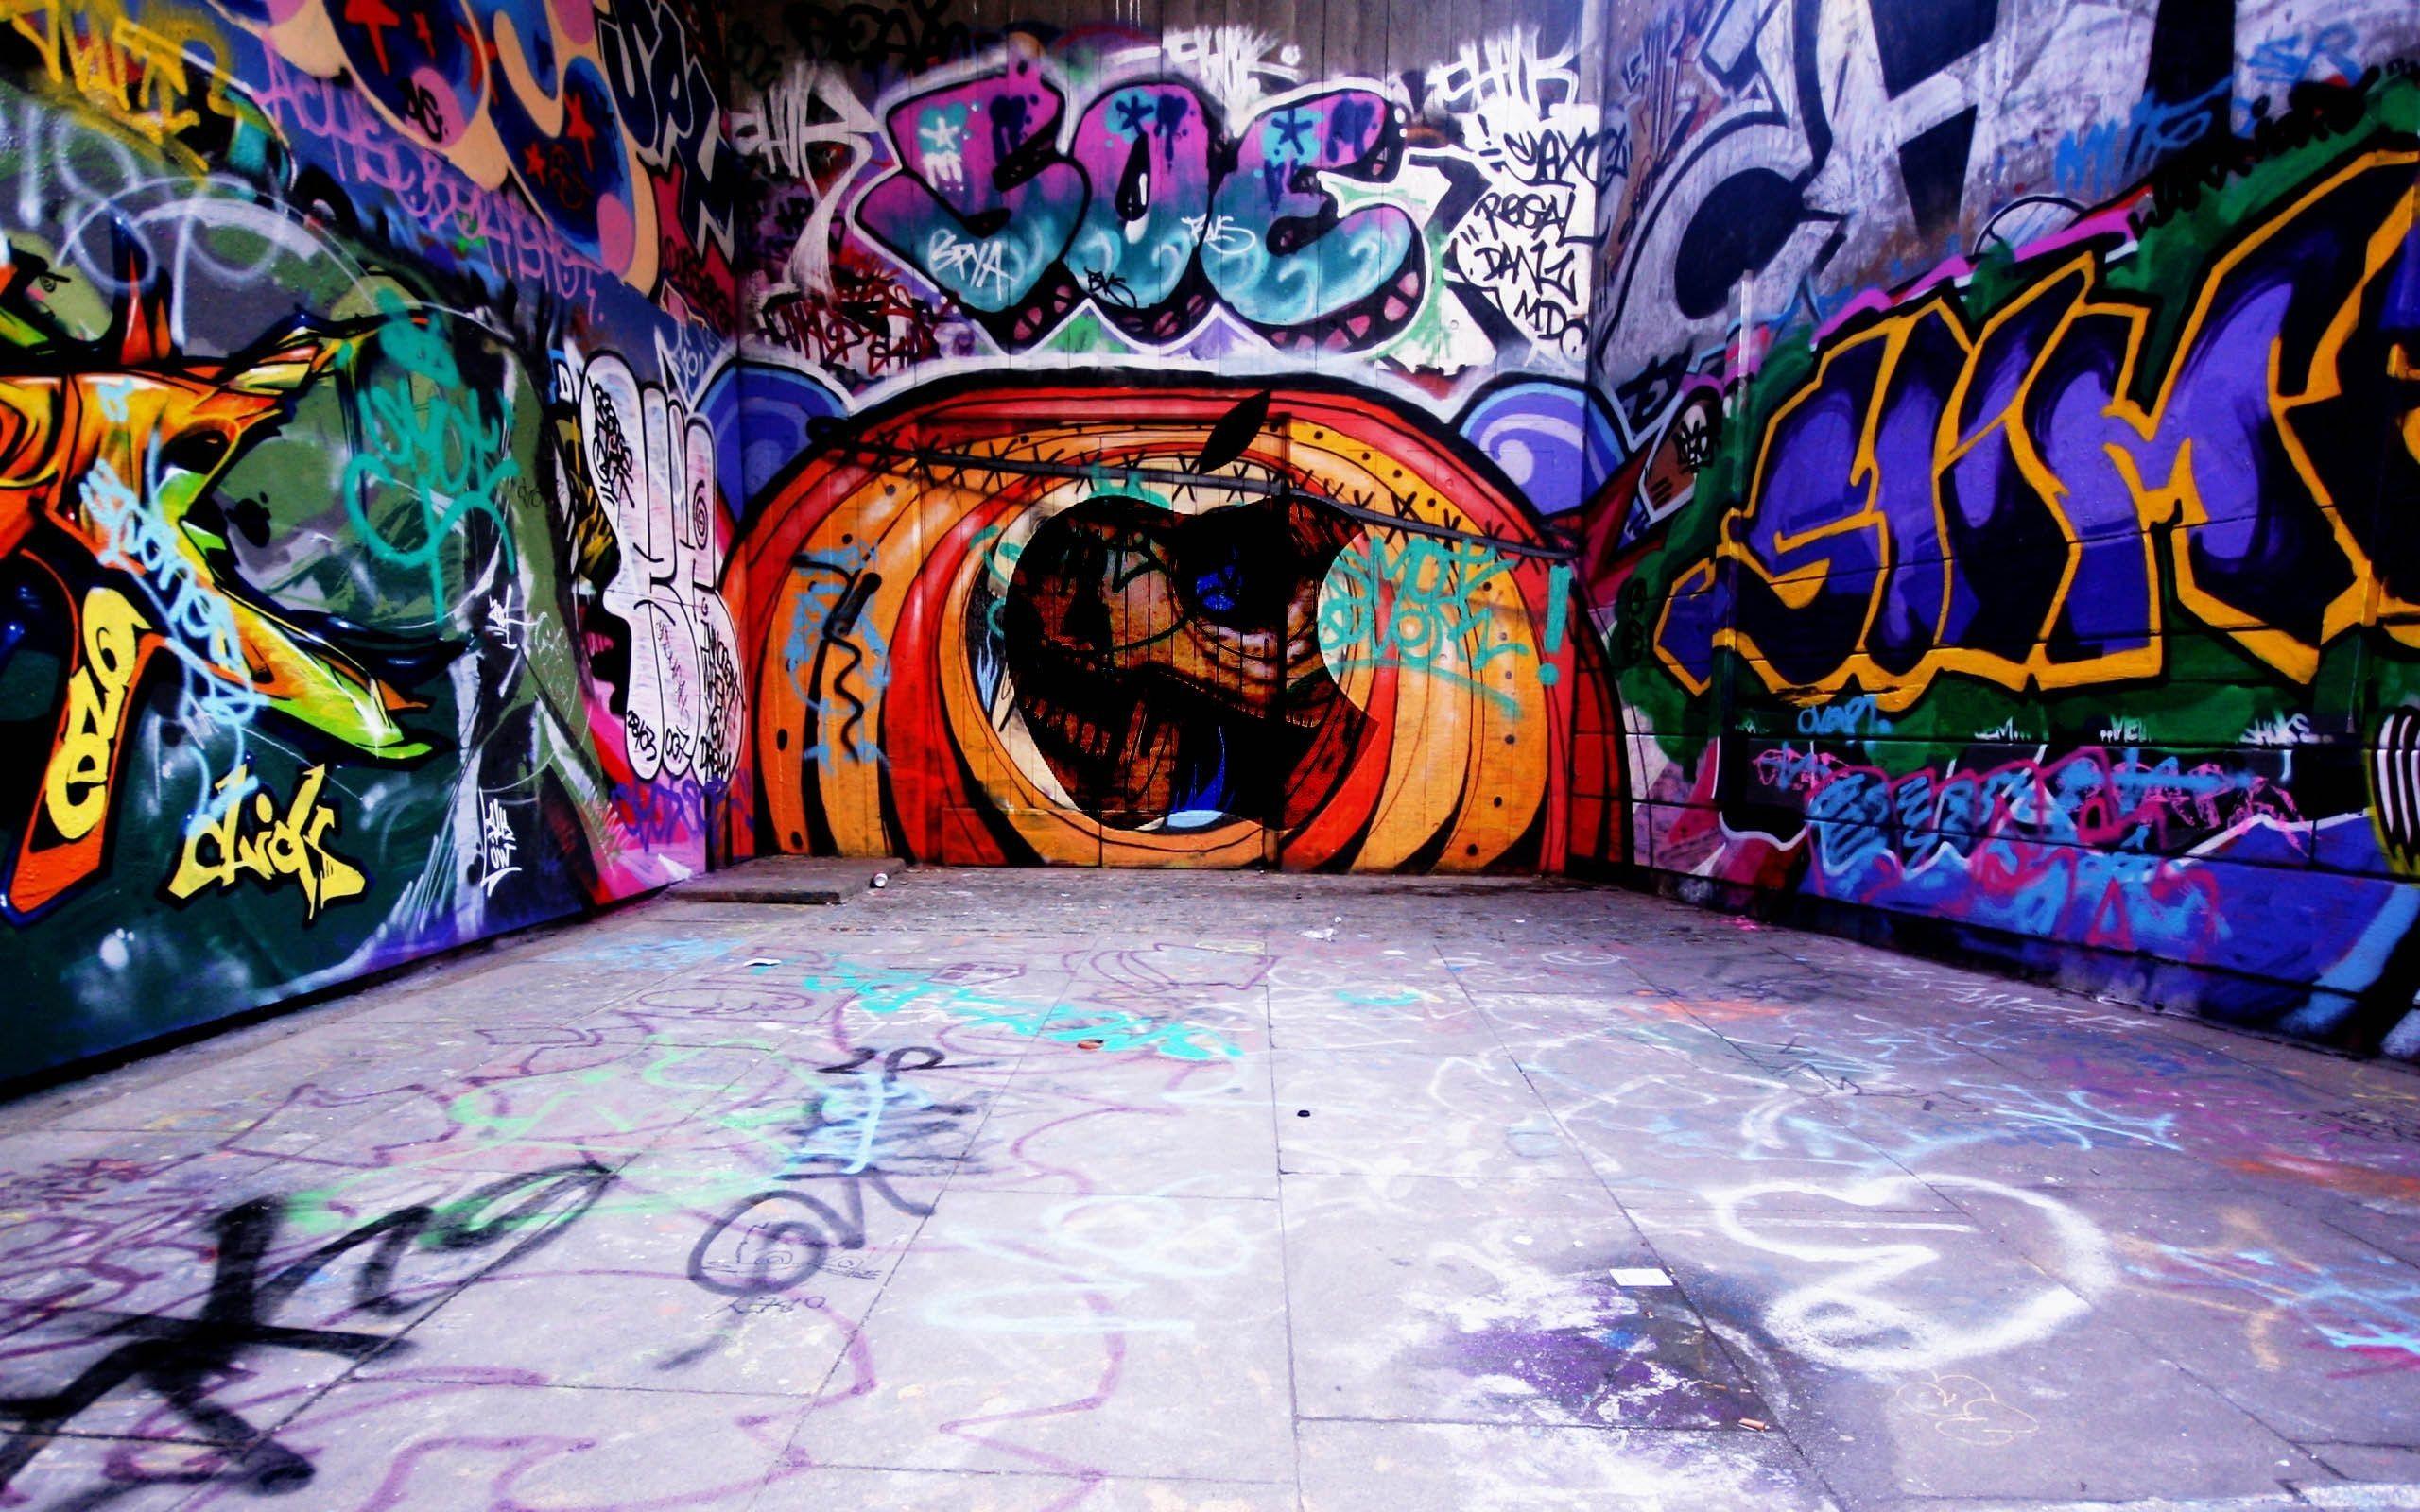 10 Latest Street Graffiti Wallpaper Hd Full Hd 1920 1080 For Pc Desktop Graffiti Pictures Art Deco Wallpaper Wall Art Wallpaper